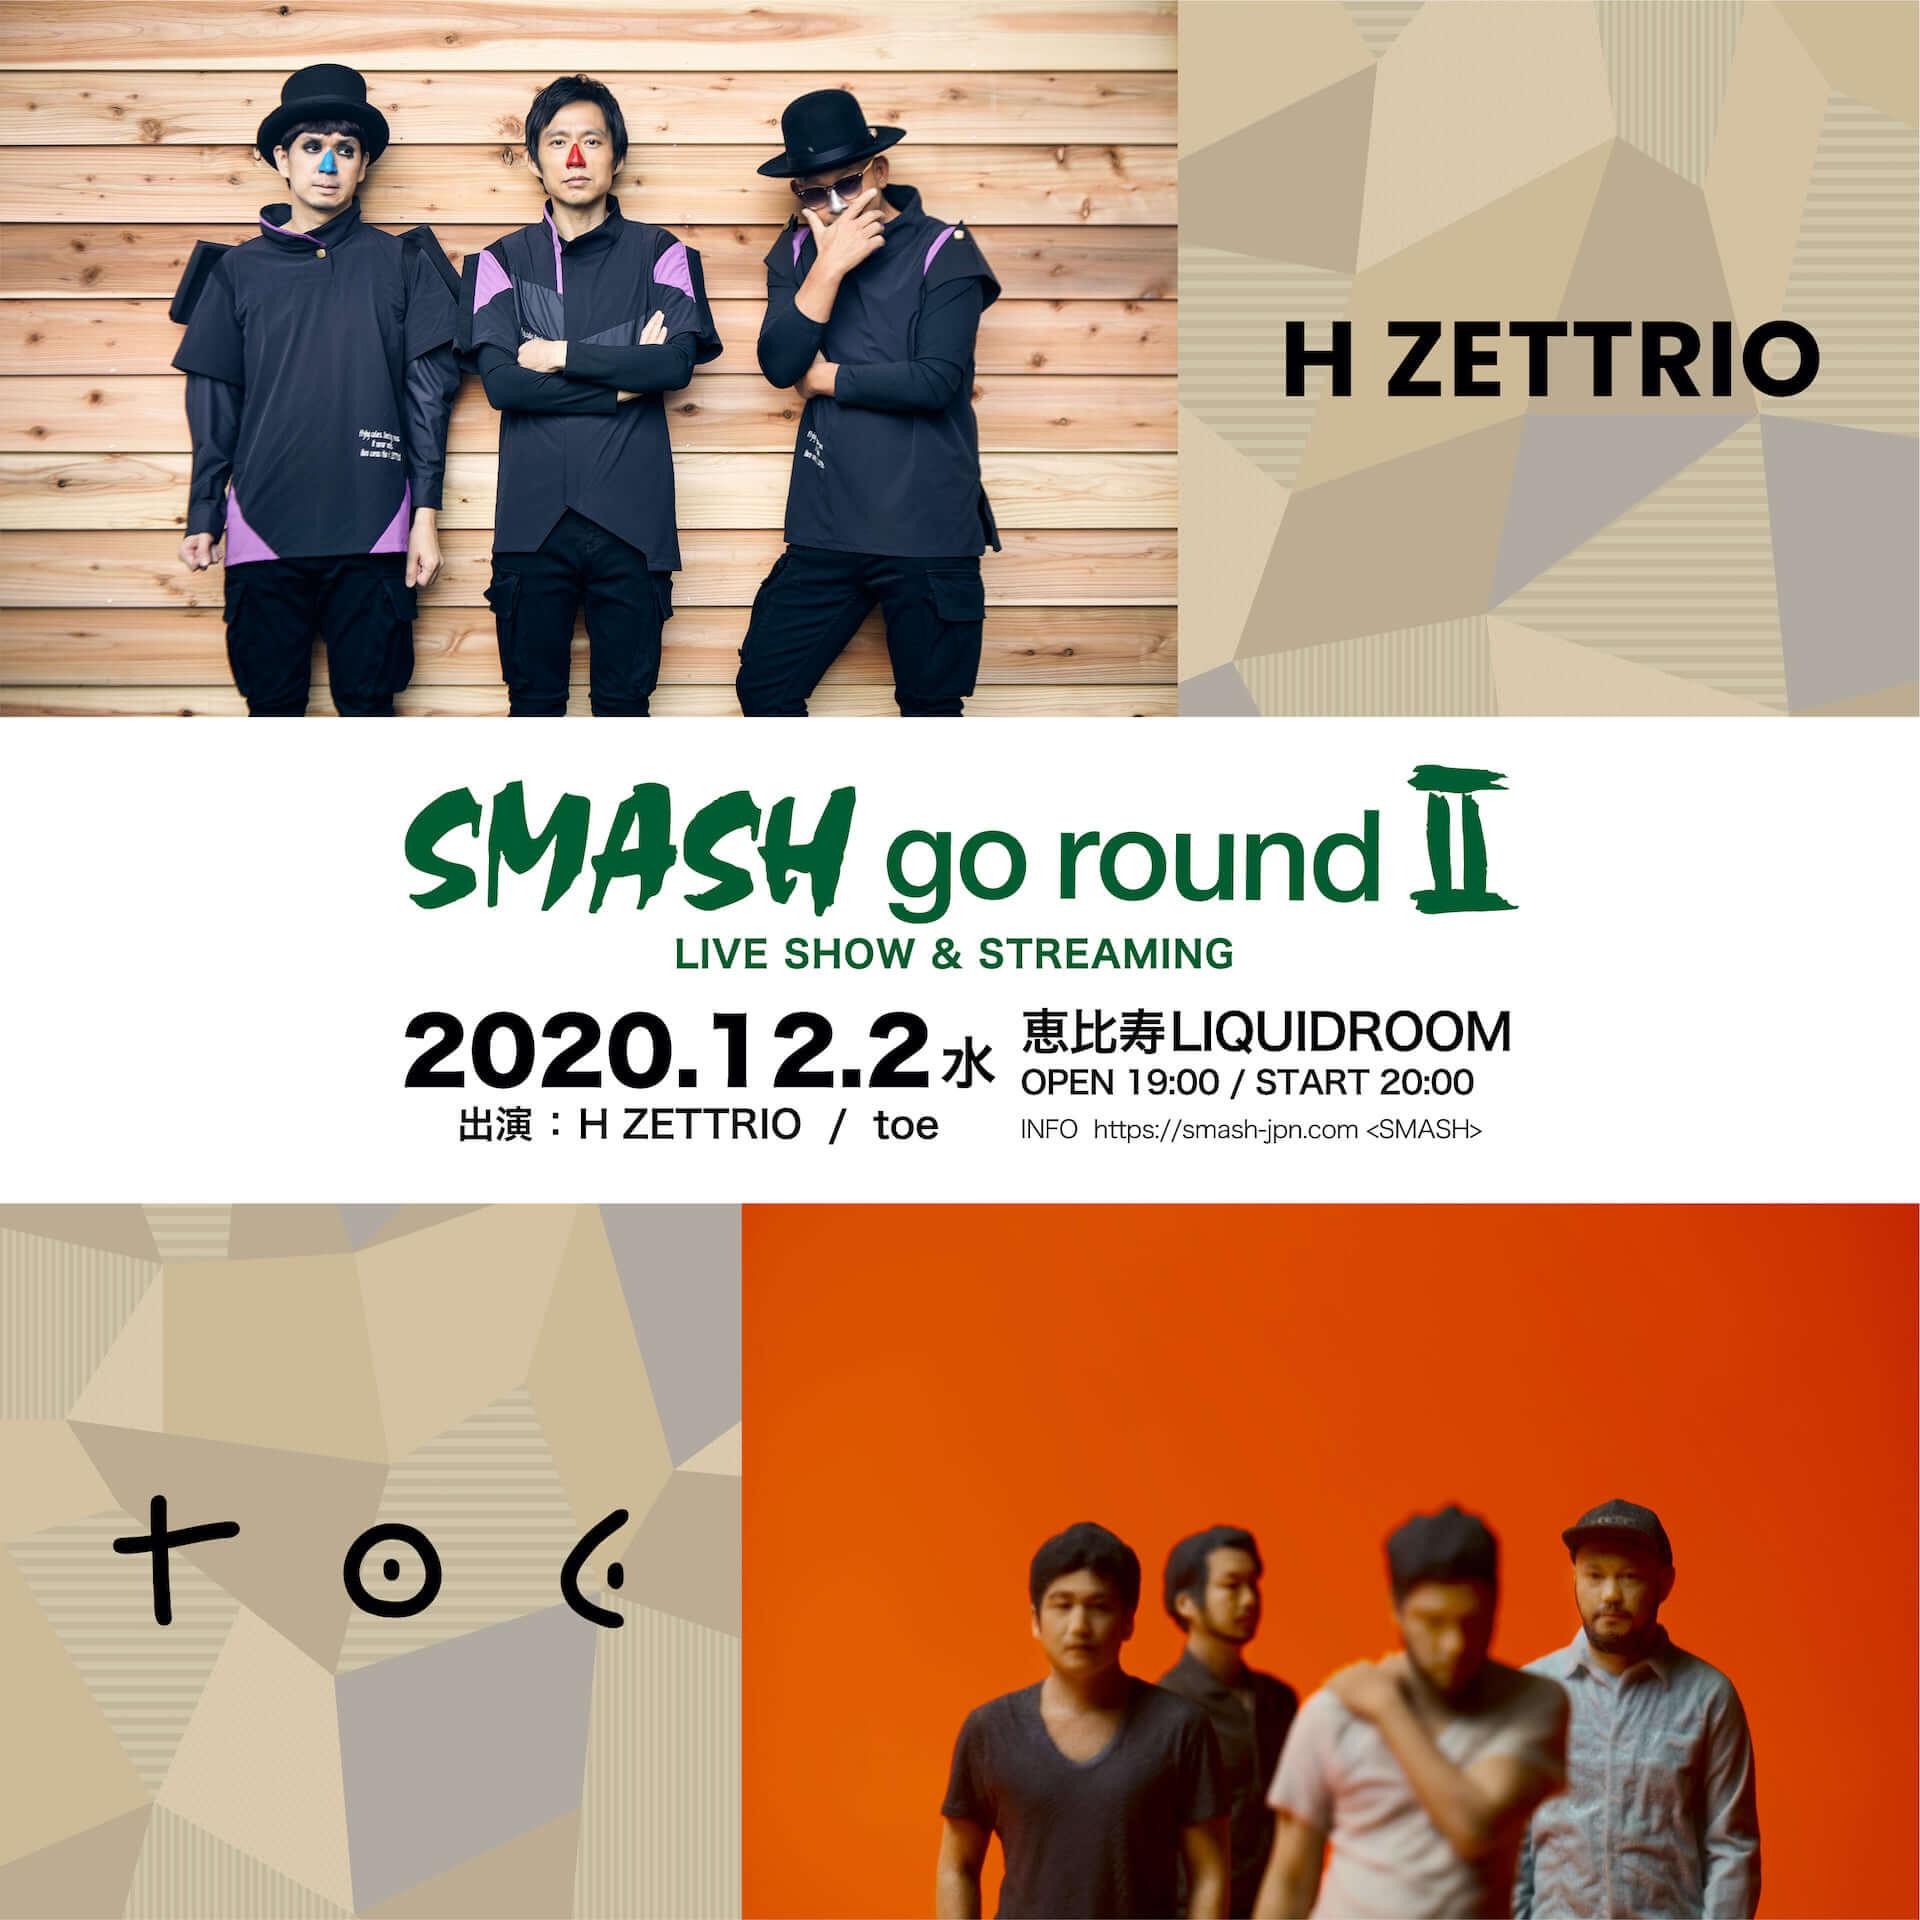 SMASHによる有観客&生配信イベント<SMASH go round Ⅱ>にtoe、H ZETTRIOが登場!恵比寿LIQUIDROOMにて来週開催 music201127_smashgoround_1-1920x1920